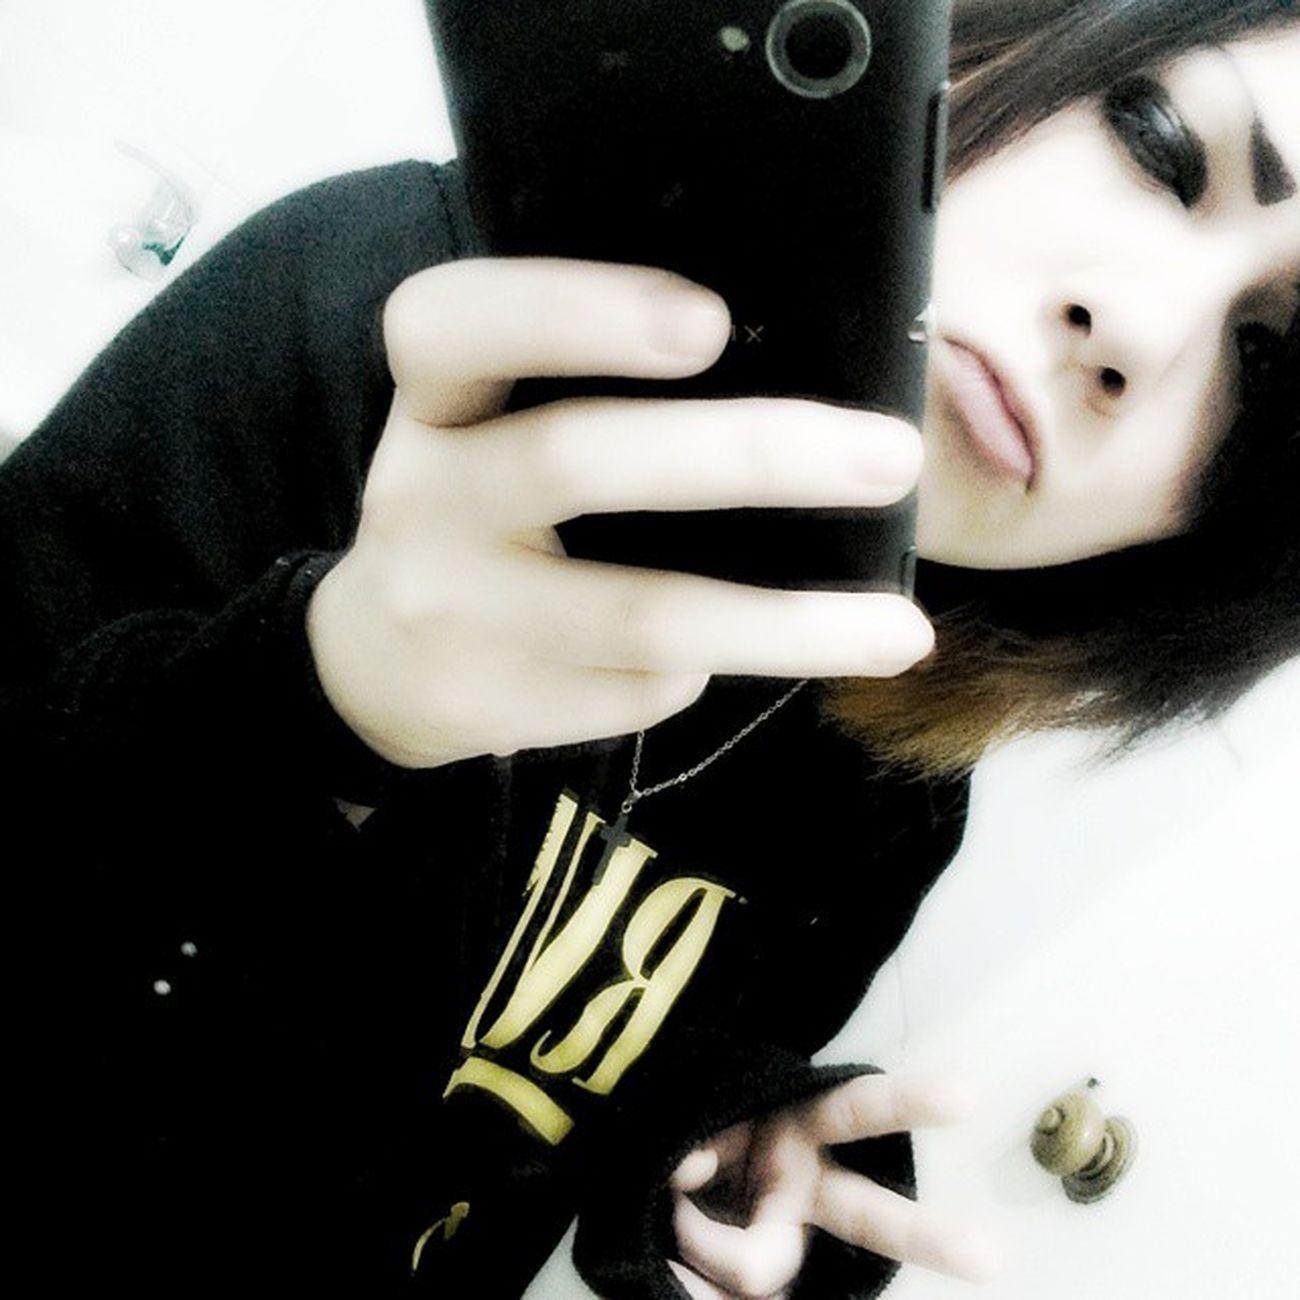 Hola, me creo Ruki. Me RukiCosplay Thegazette Yesterday Takanori Cosplay JRock Style Japanese Boy